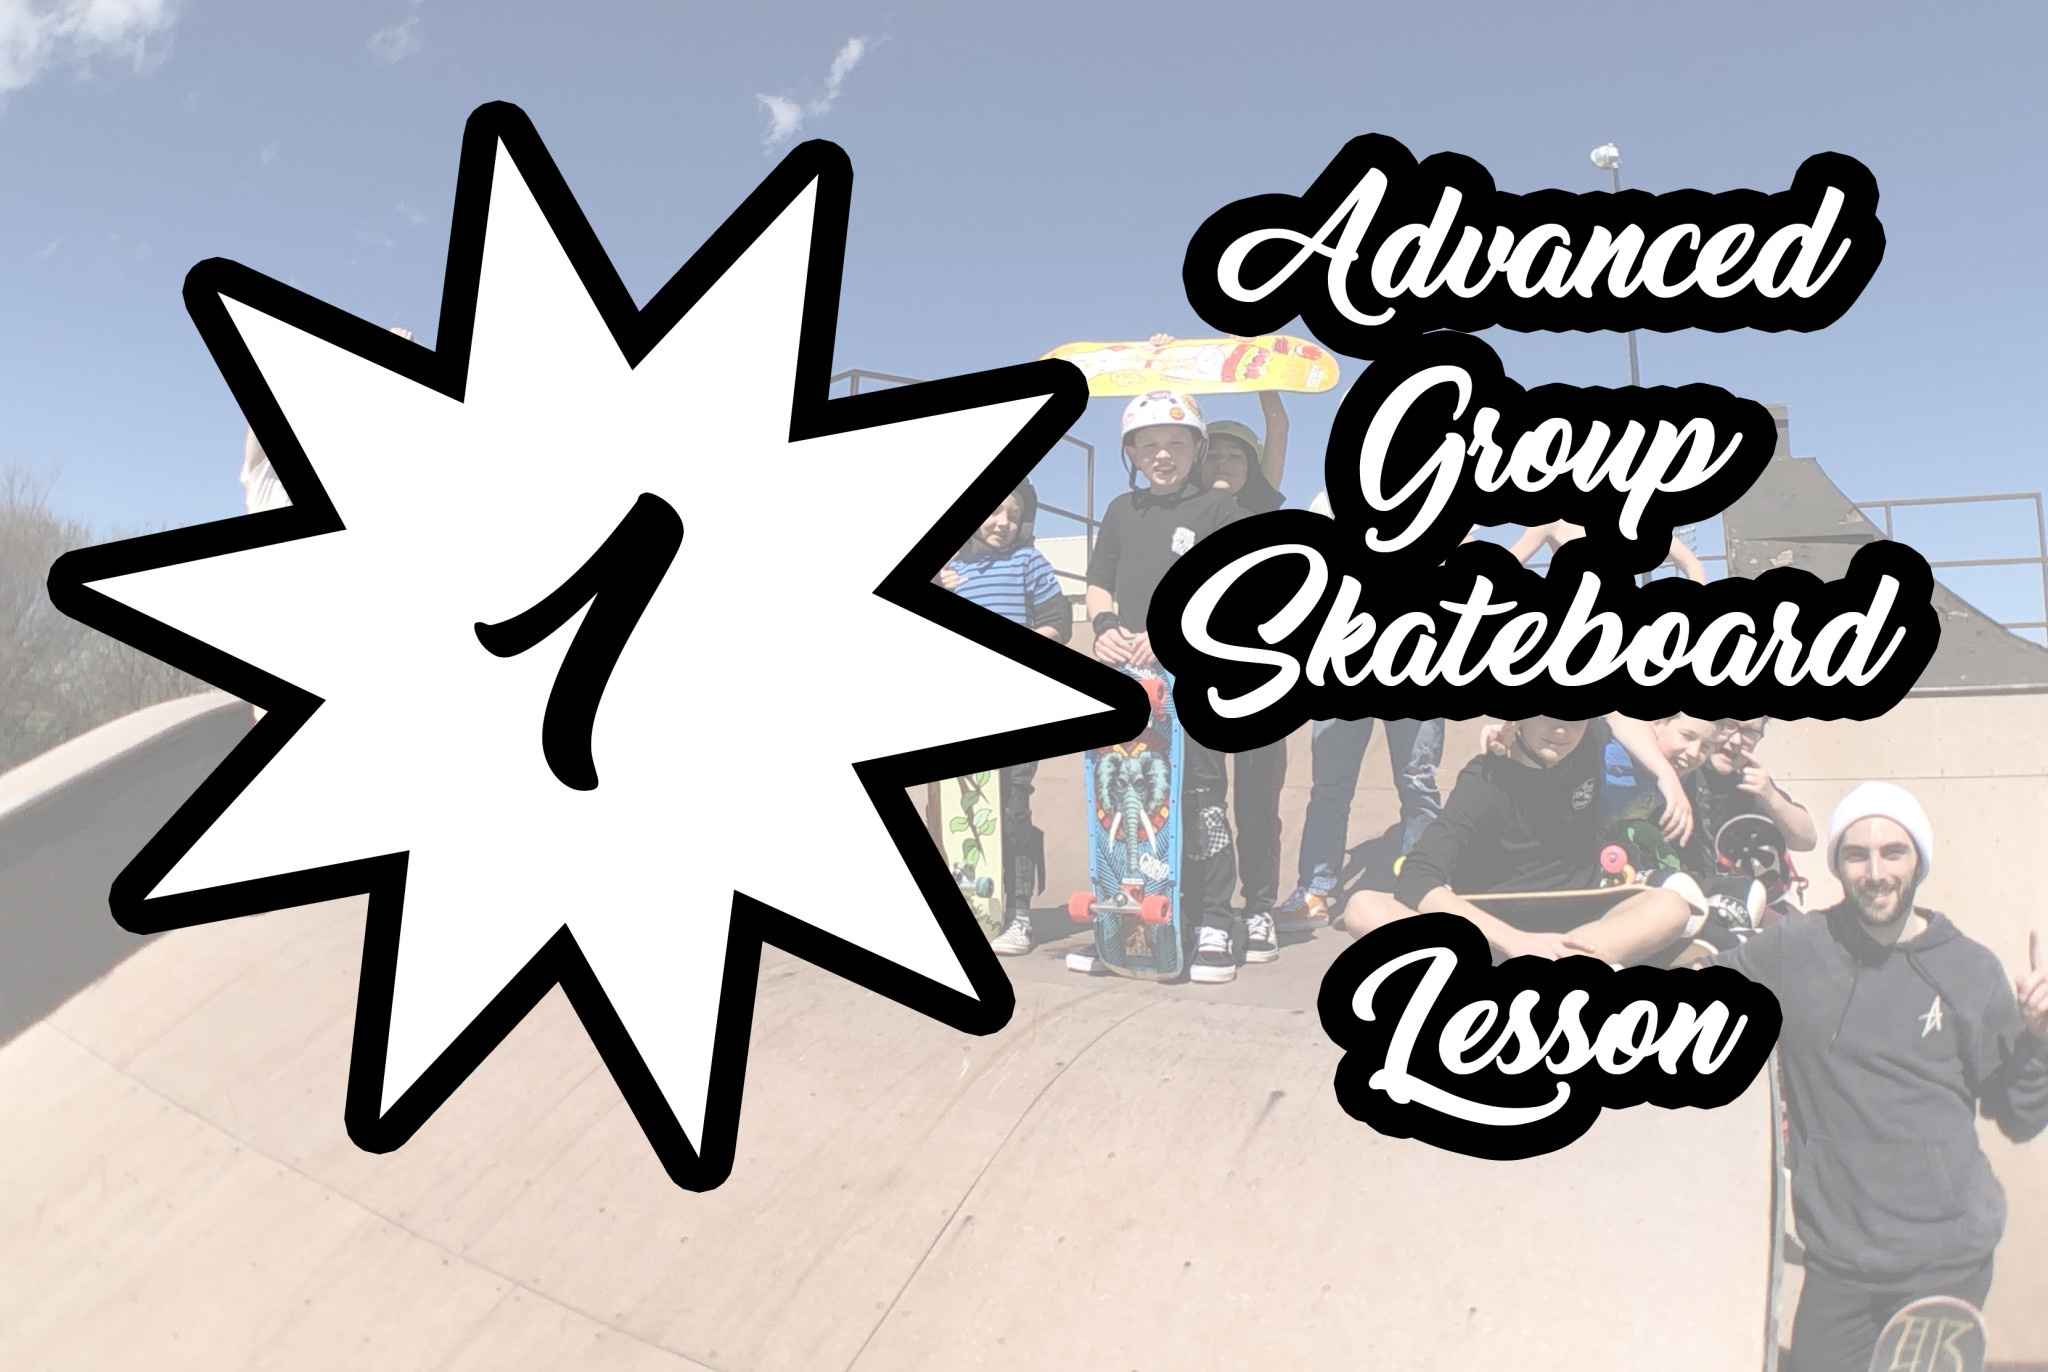 Advanced Session Group Skateboard Lesson 1 Pack